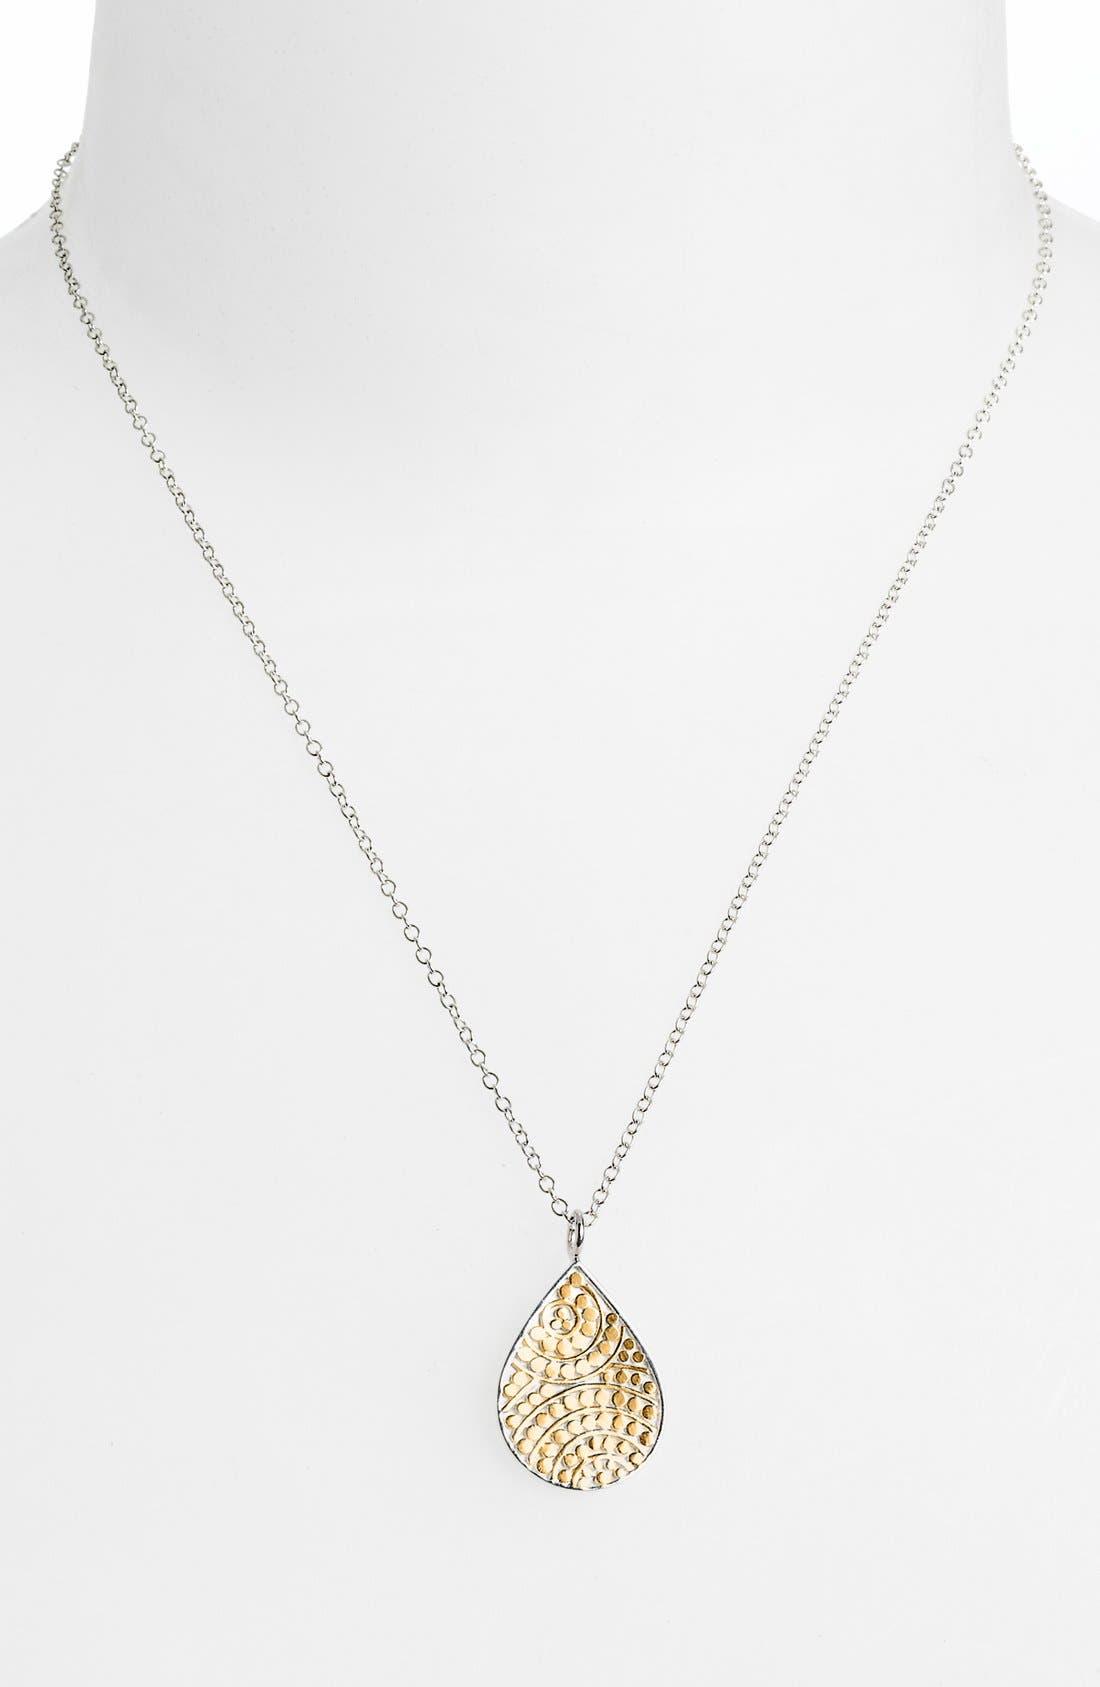 Main Image - Anna Beck 'Rajua' Small Reversible Teardrop Necklace